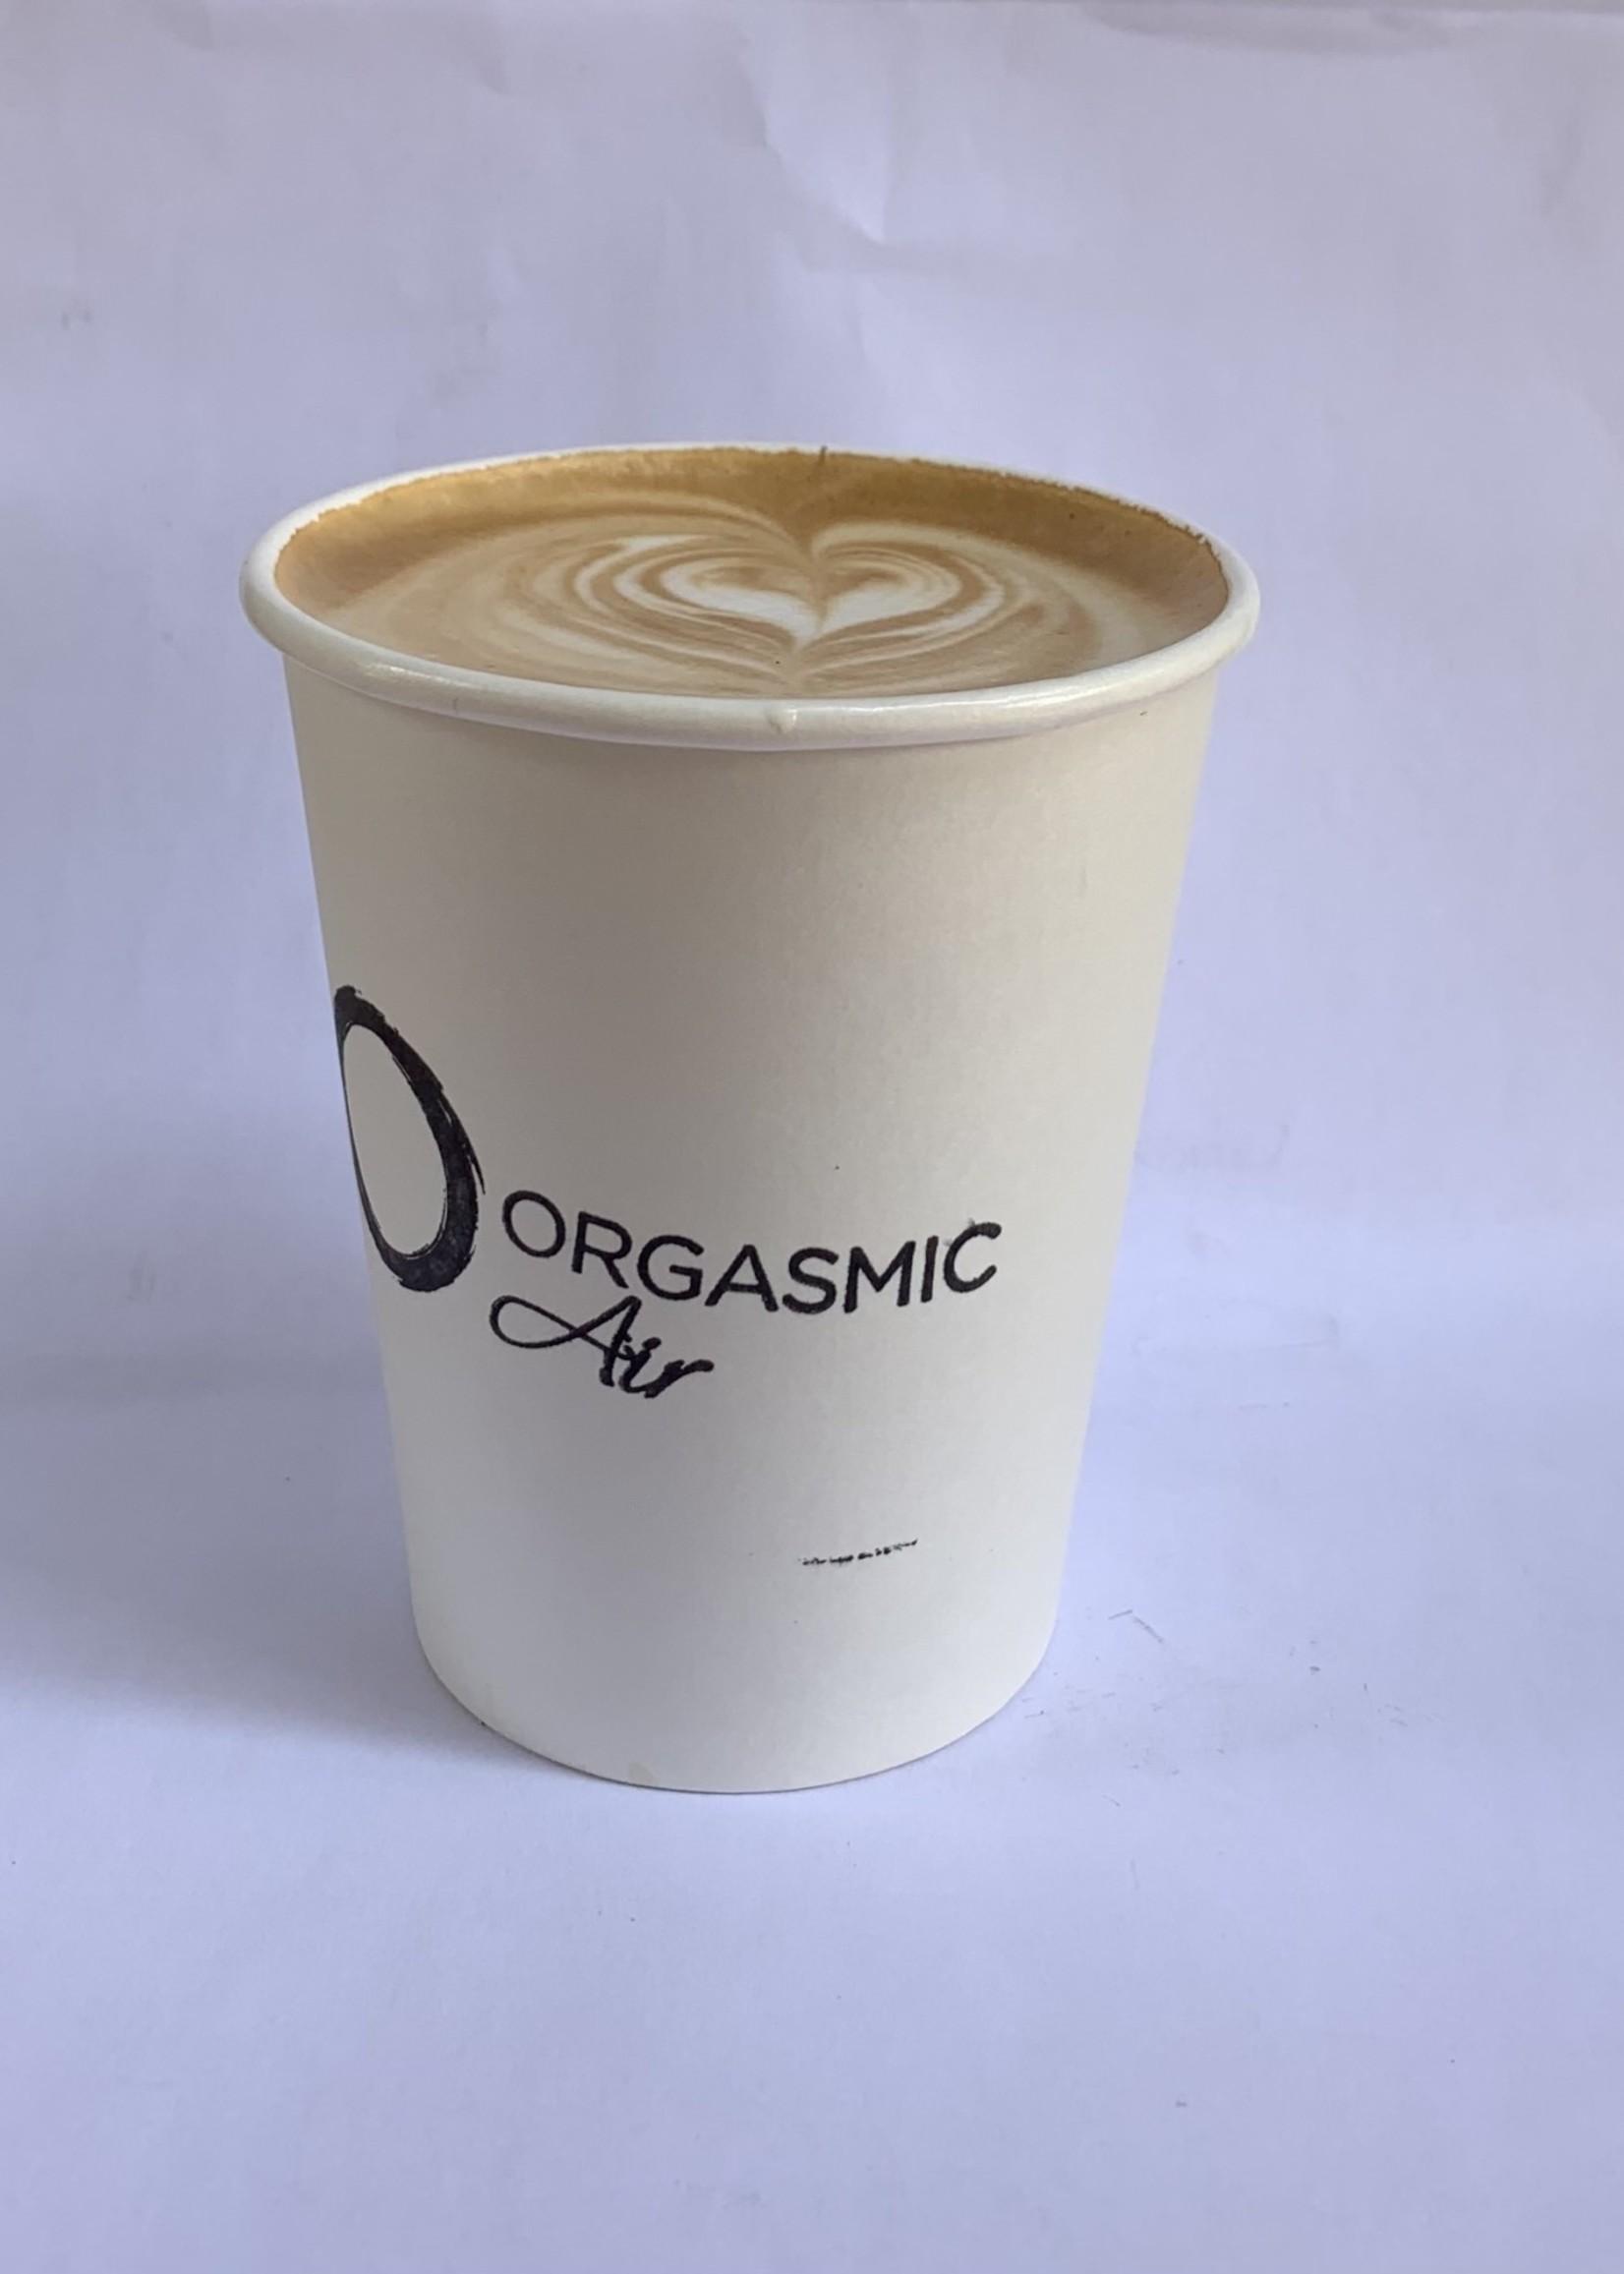 Organic & Air CBD infused vanilla cappuccino